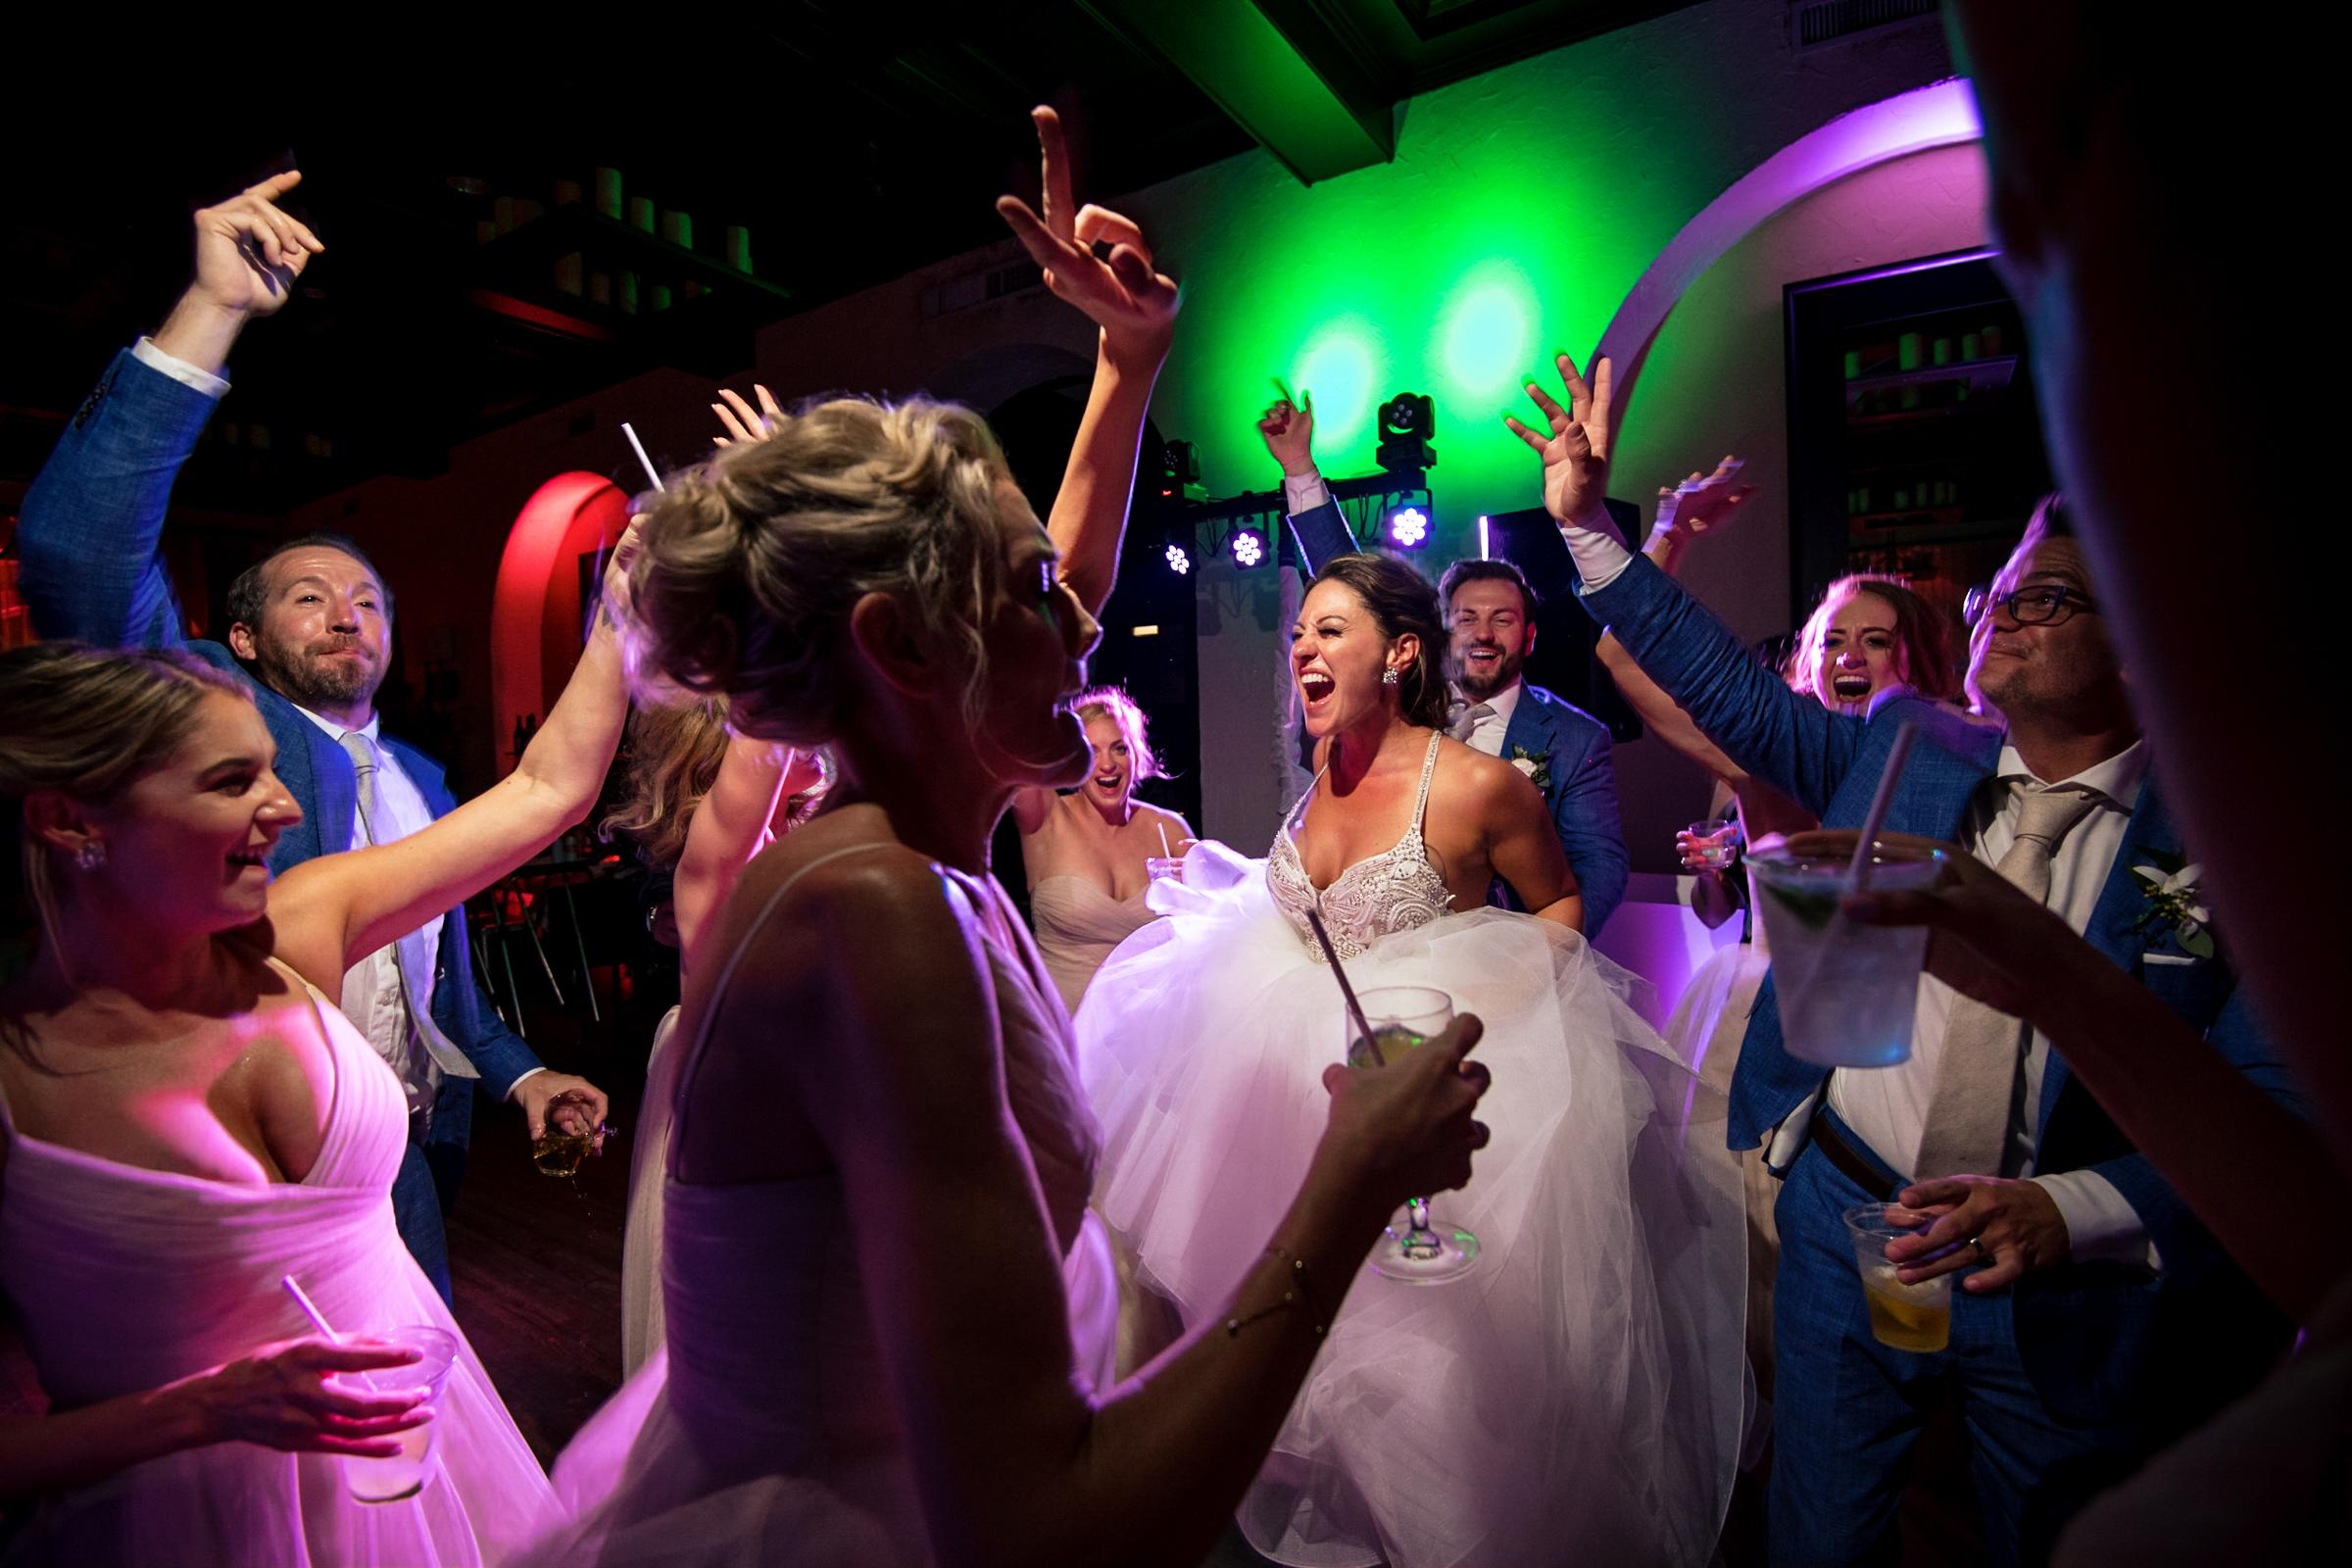 Wedding reception dance party - Michael Freas - North Carolina